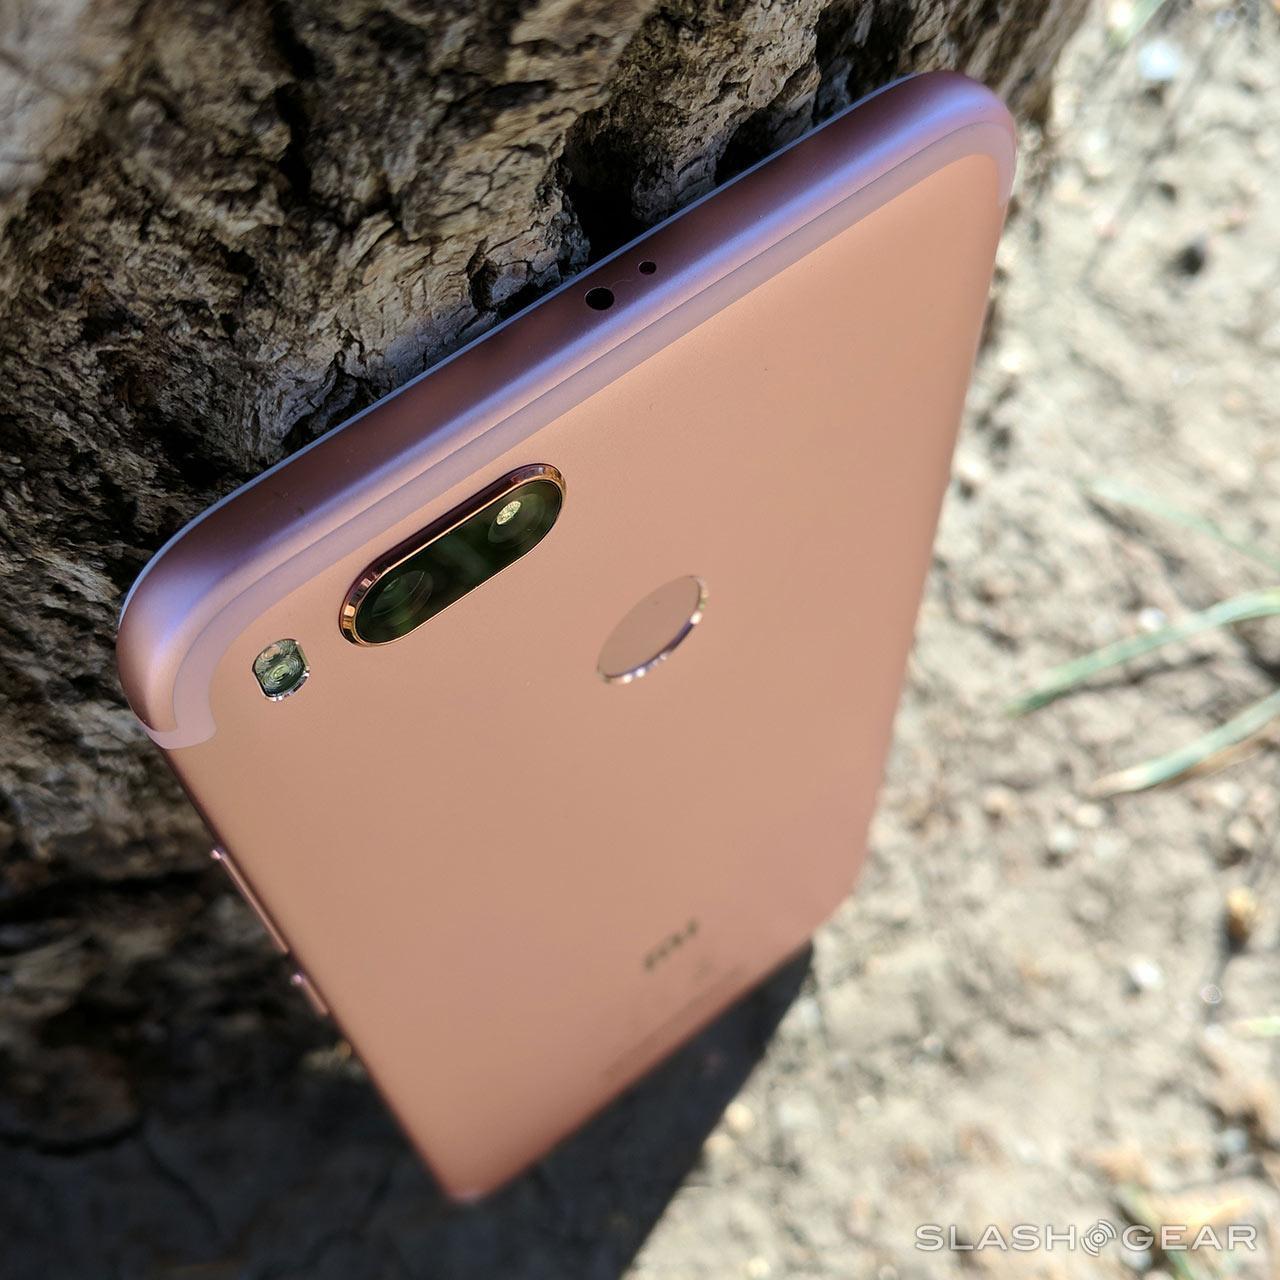 Xiaomi Mi A1 Review : Android One just got familiar - SlashGear